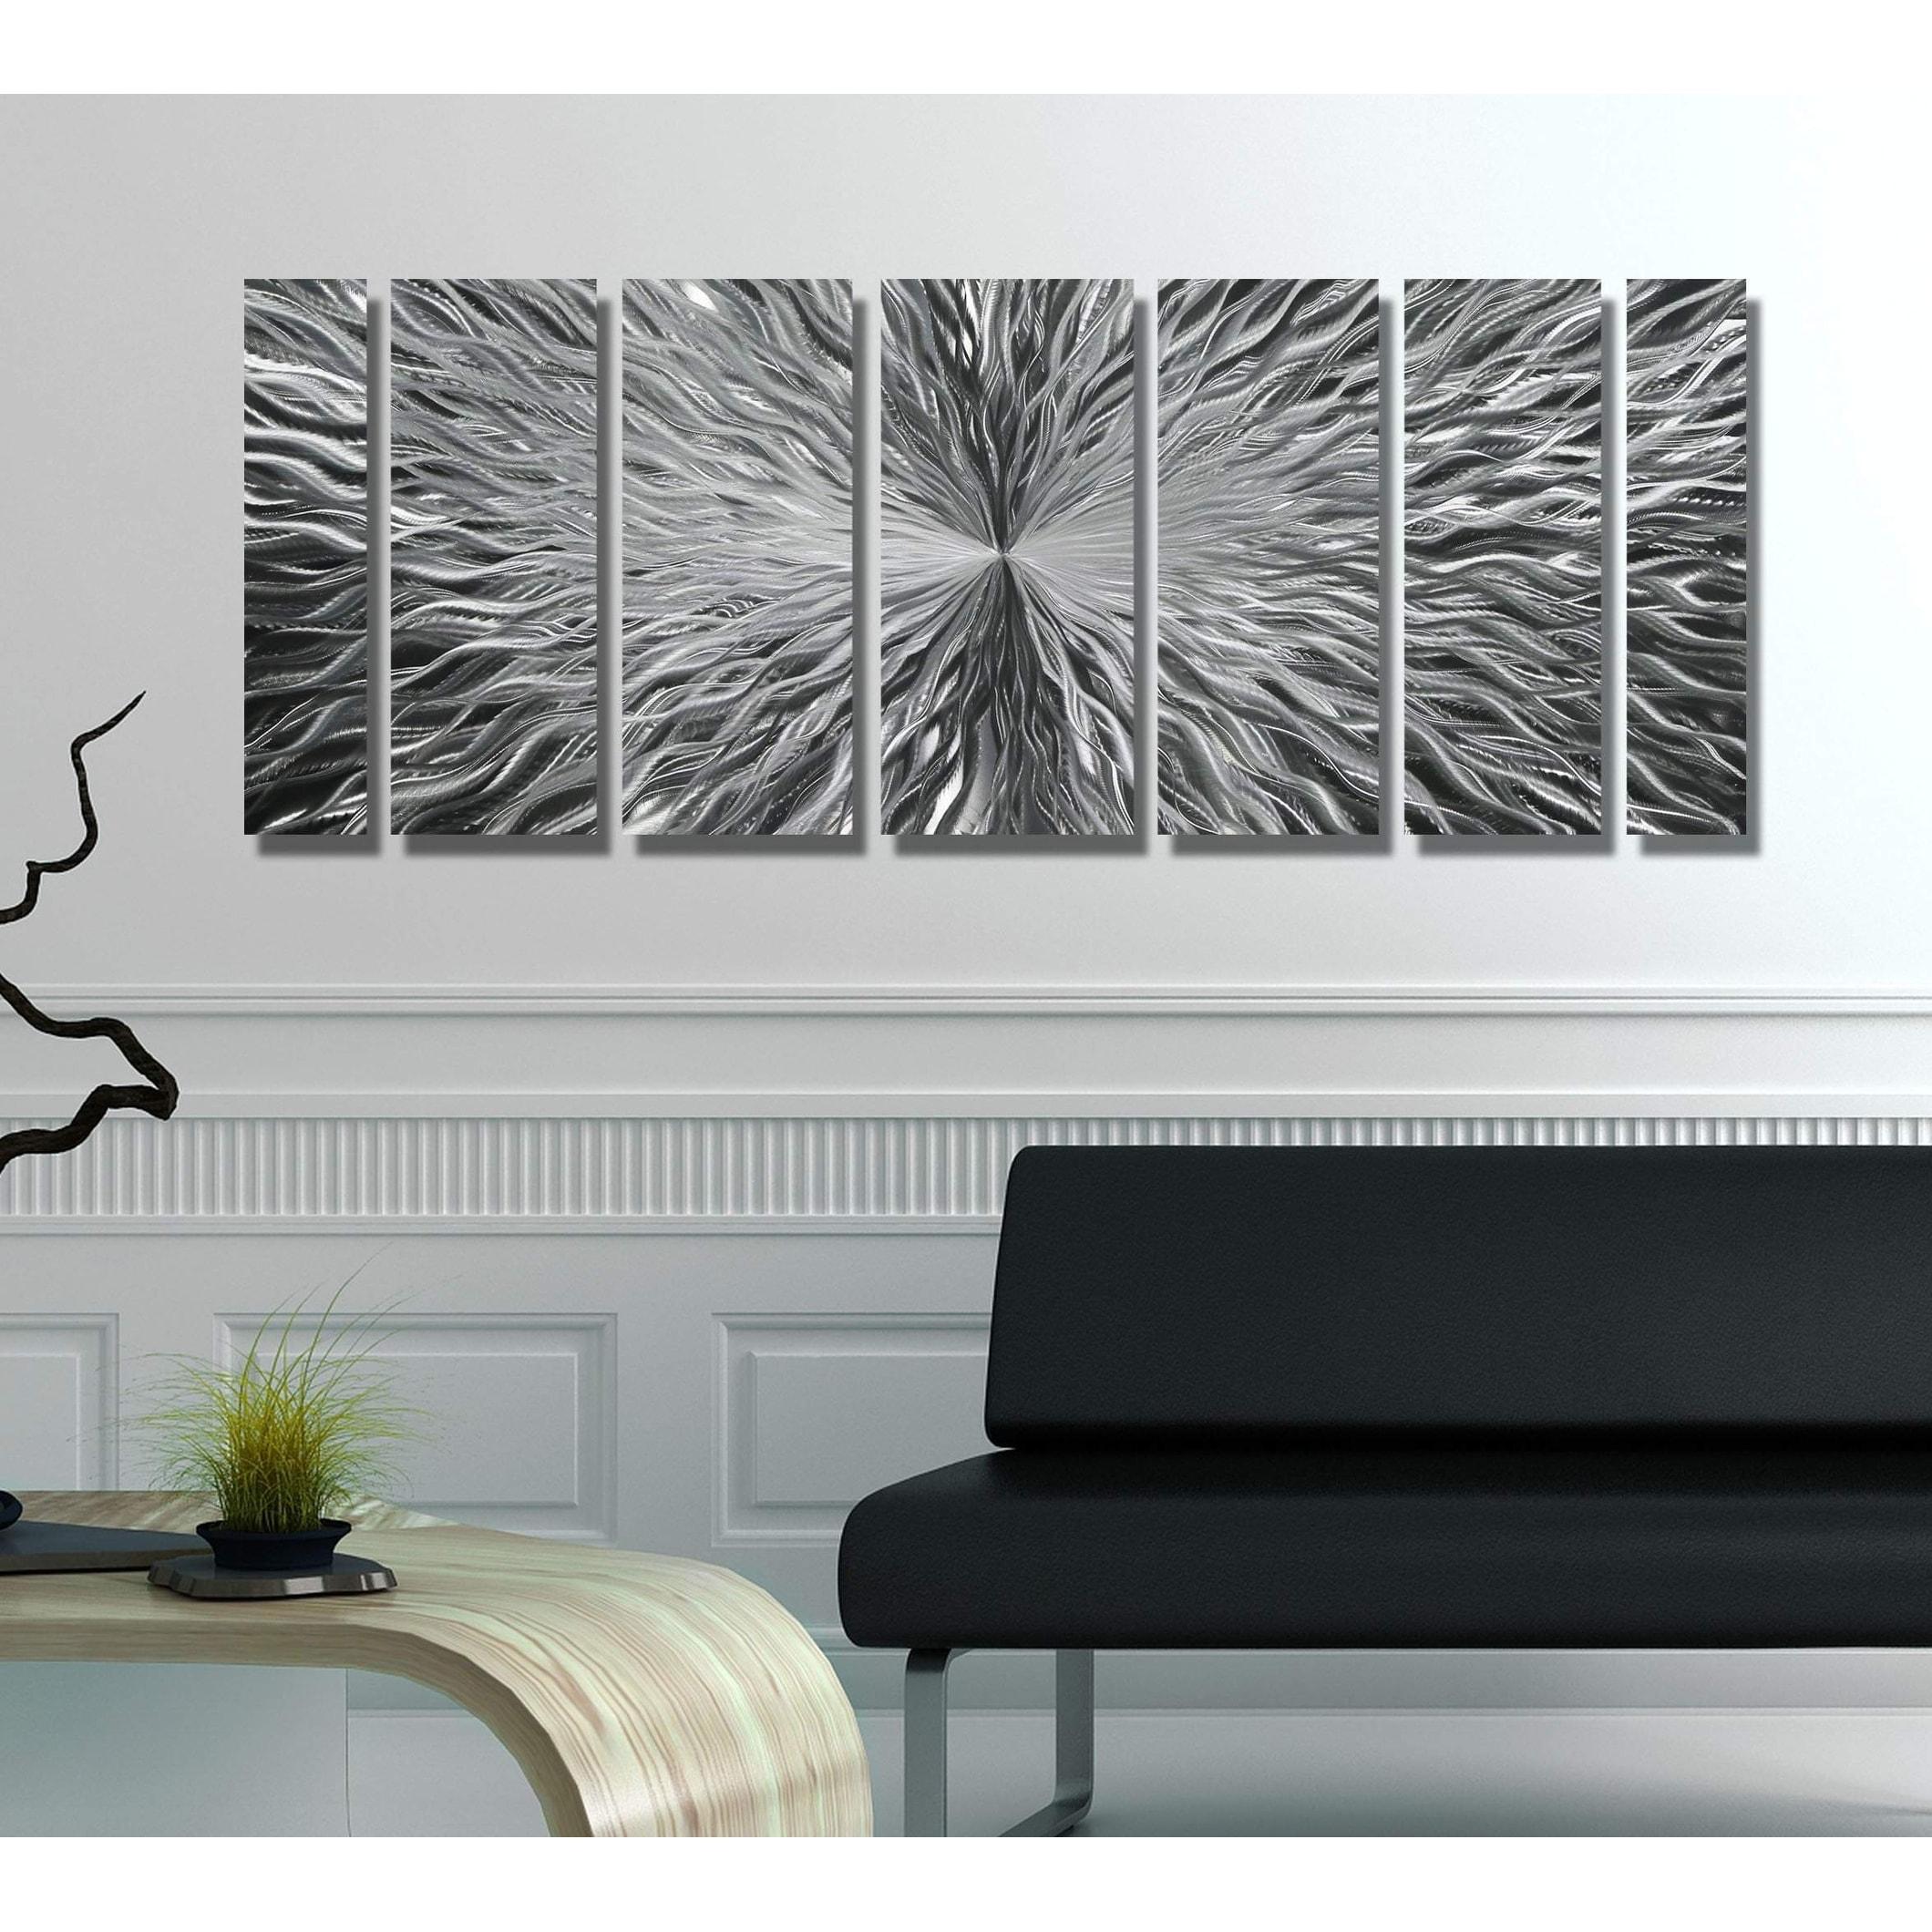 Jon Allen Metal Wall Art Large Silver Abstract Hanging Sculpture Decor Vortex